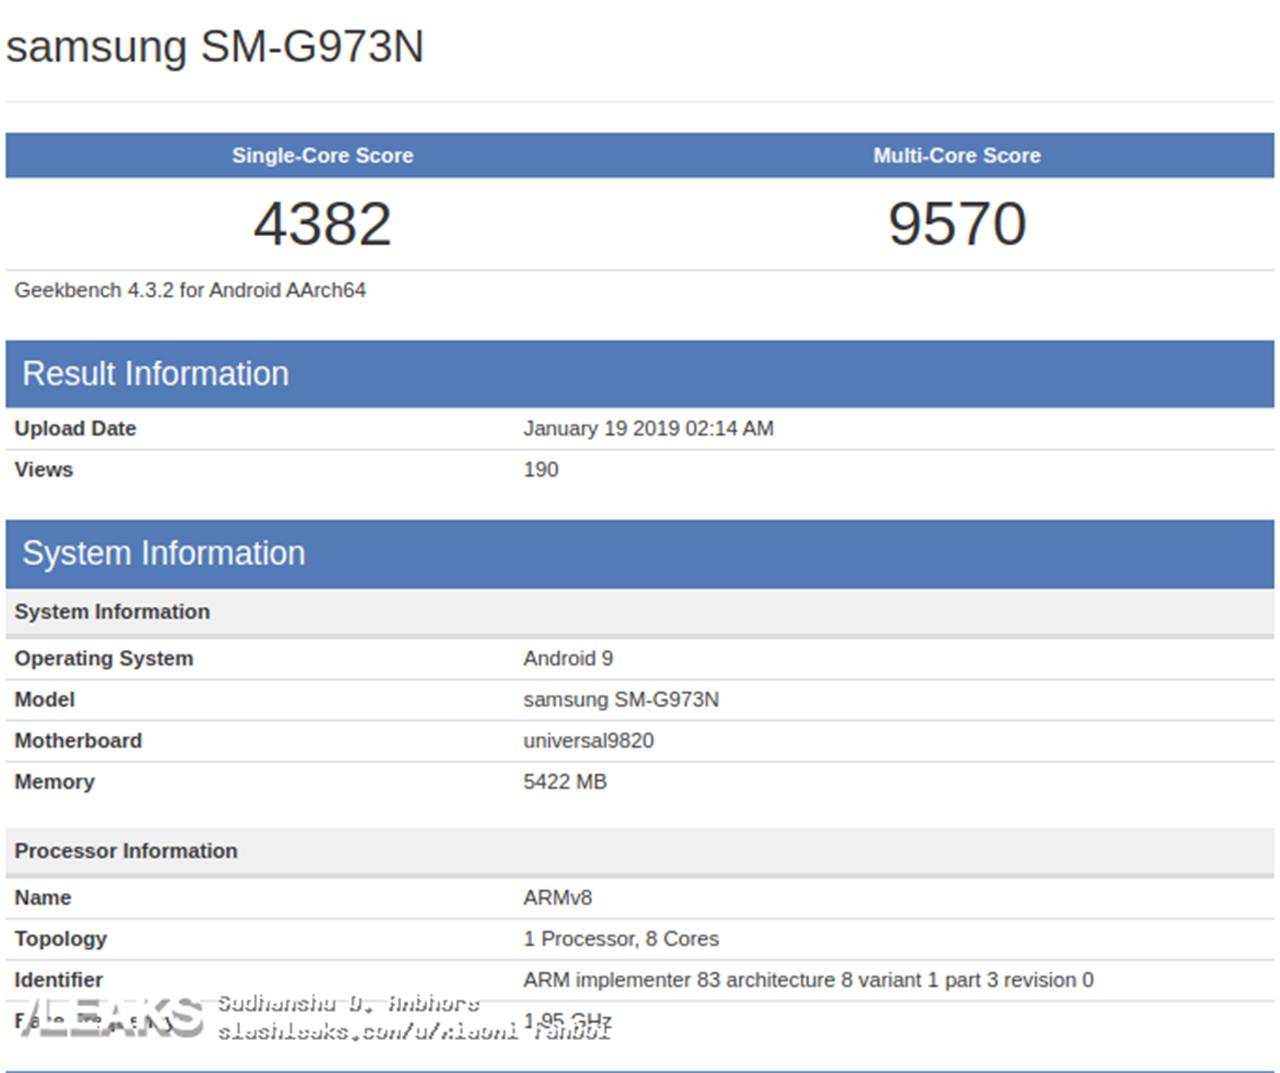 Samsung Galaxy S10 Exynos 9820 variant Geekbench score